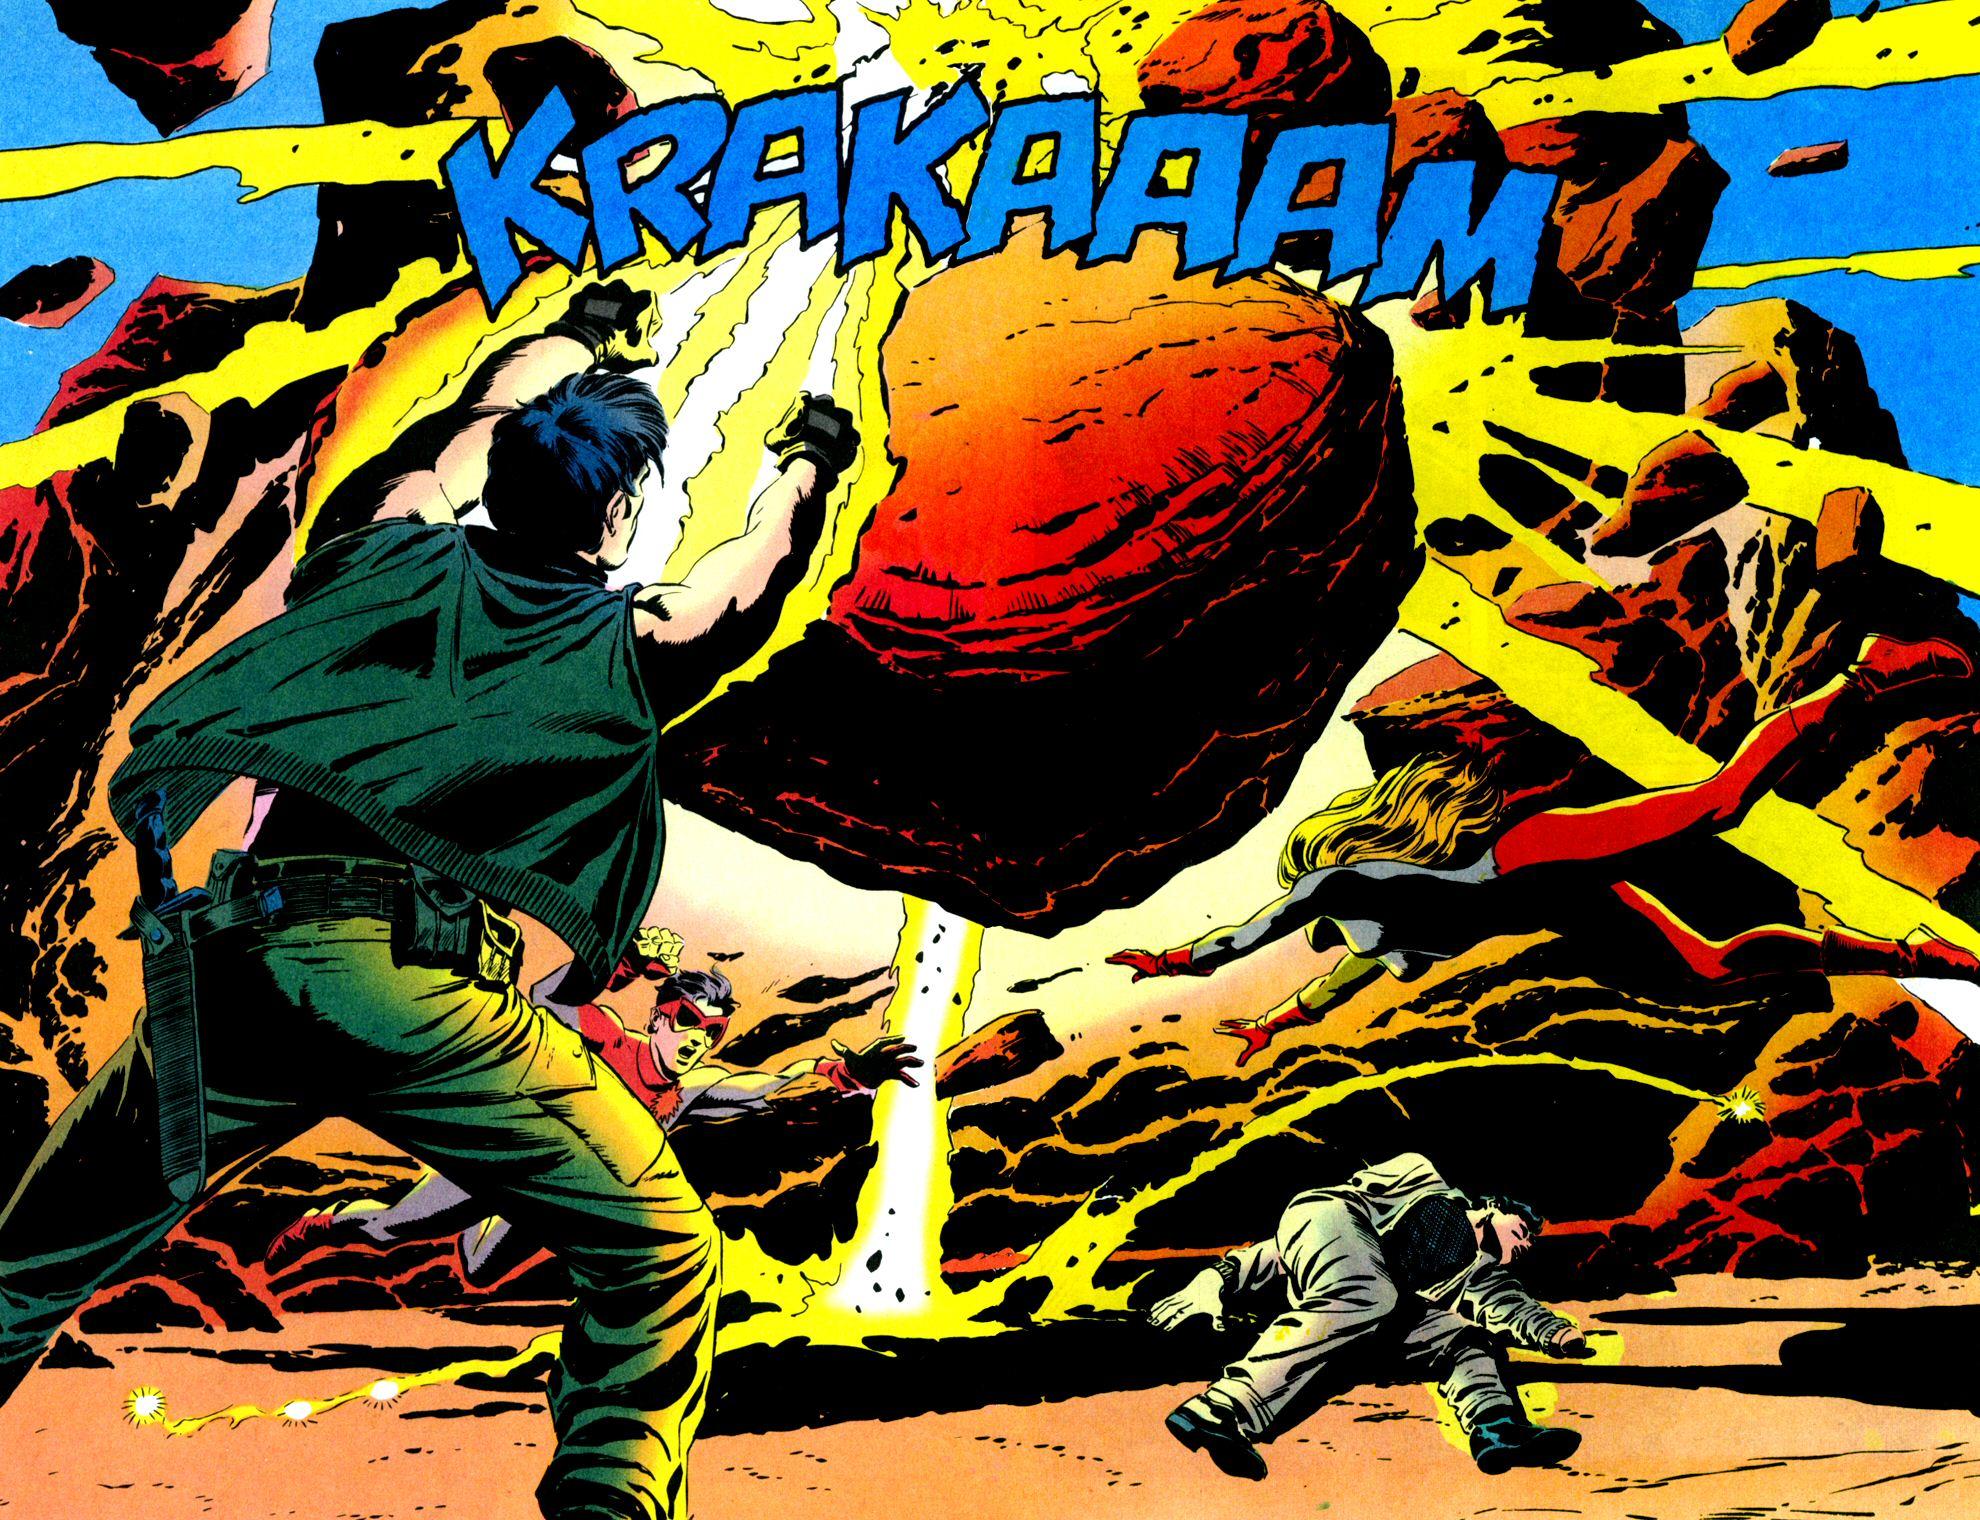 Read online Powerline comic -  Issue #8 - 26